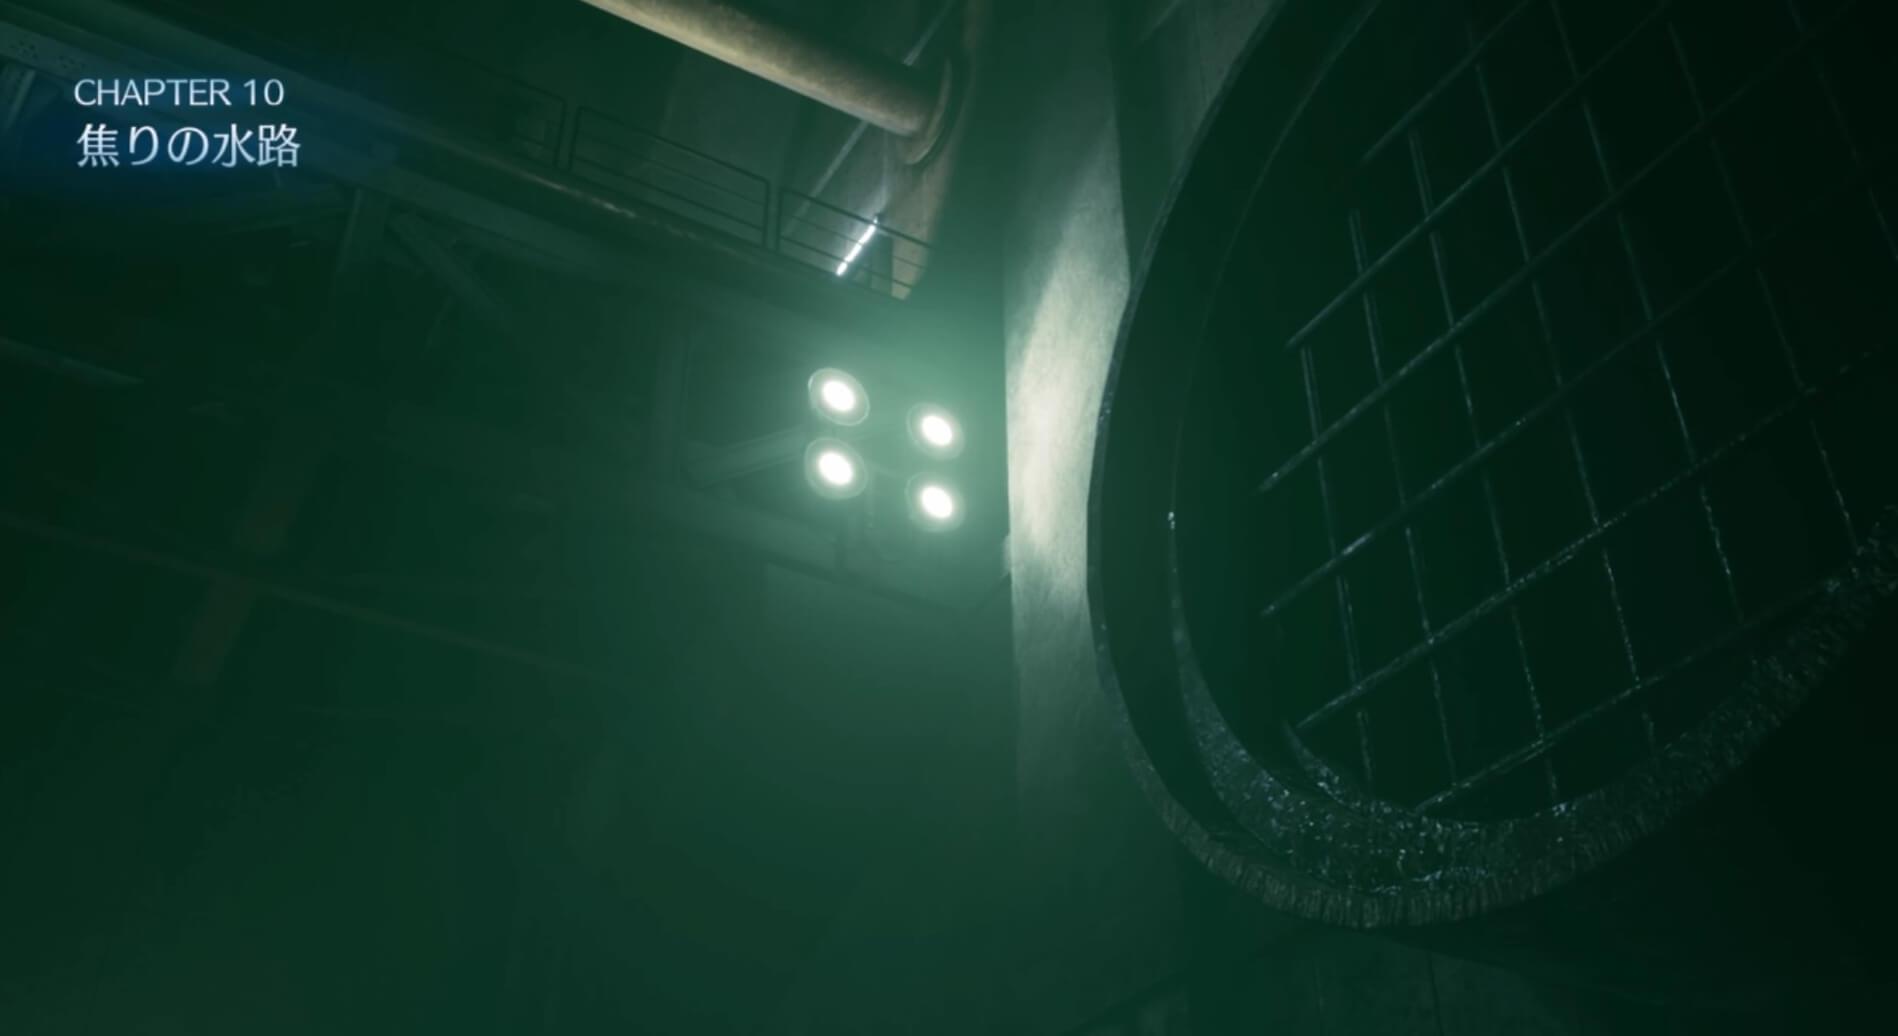 FF7リメイク『地下下水道』のマップと宝箱の場所一覧